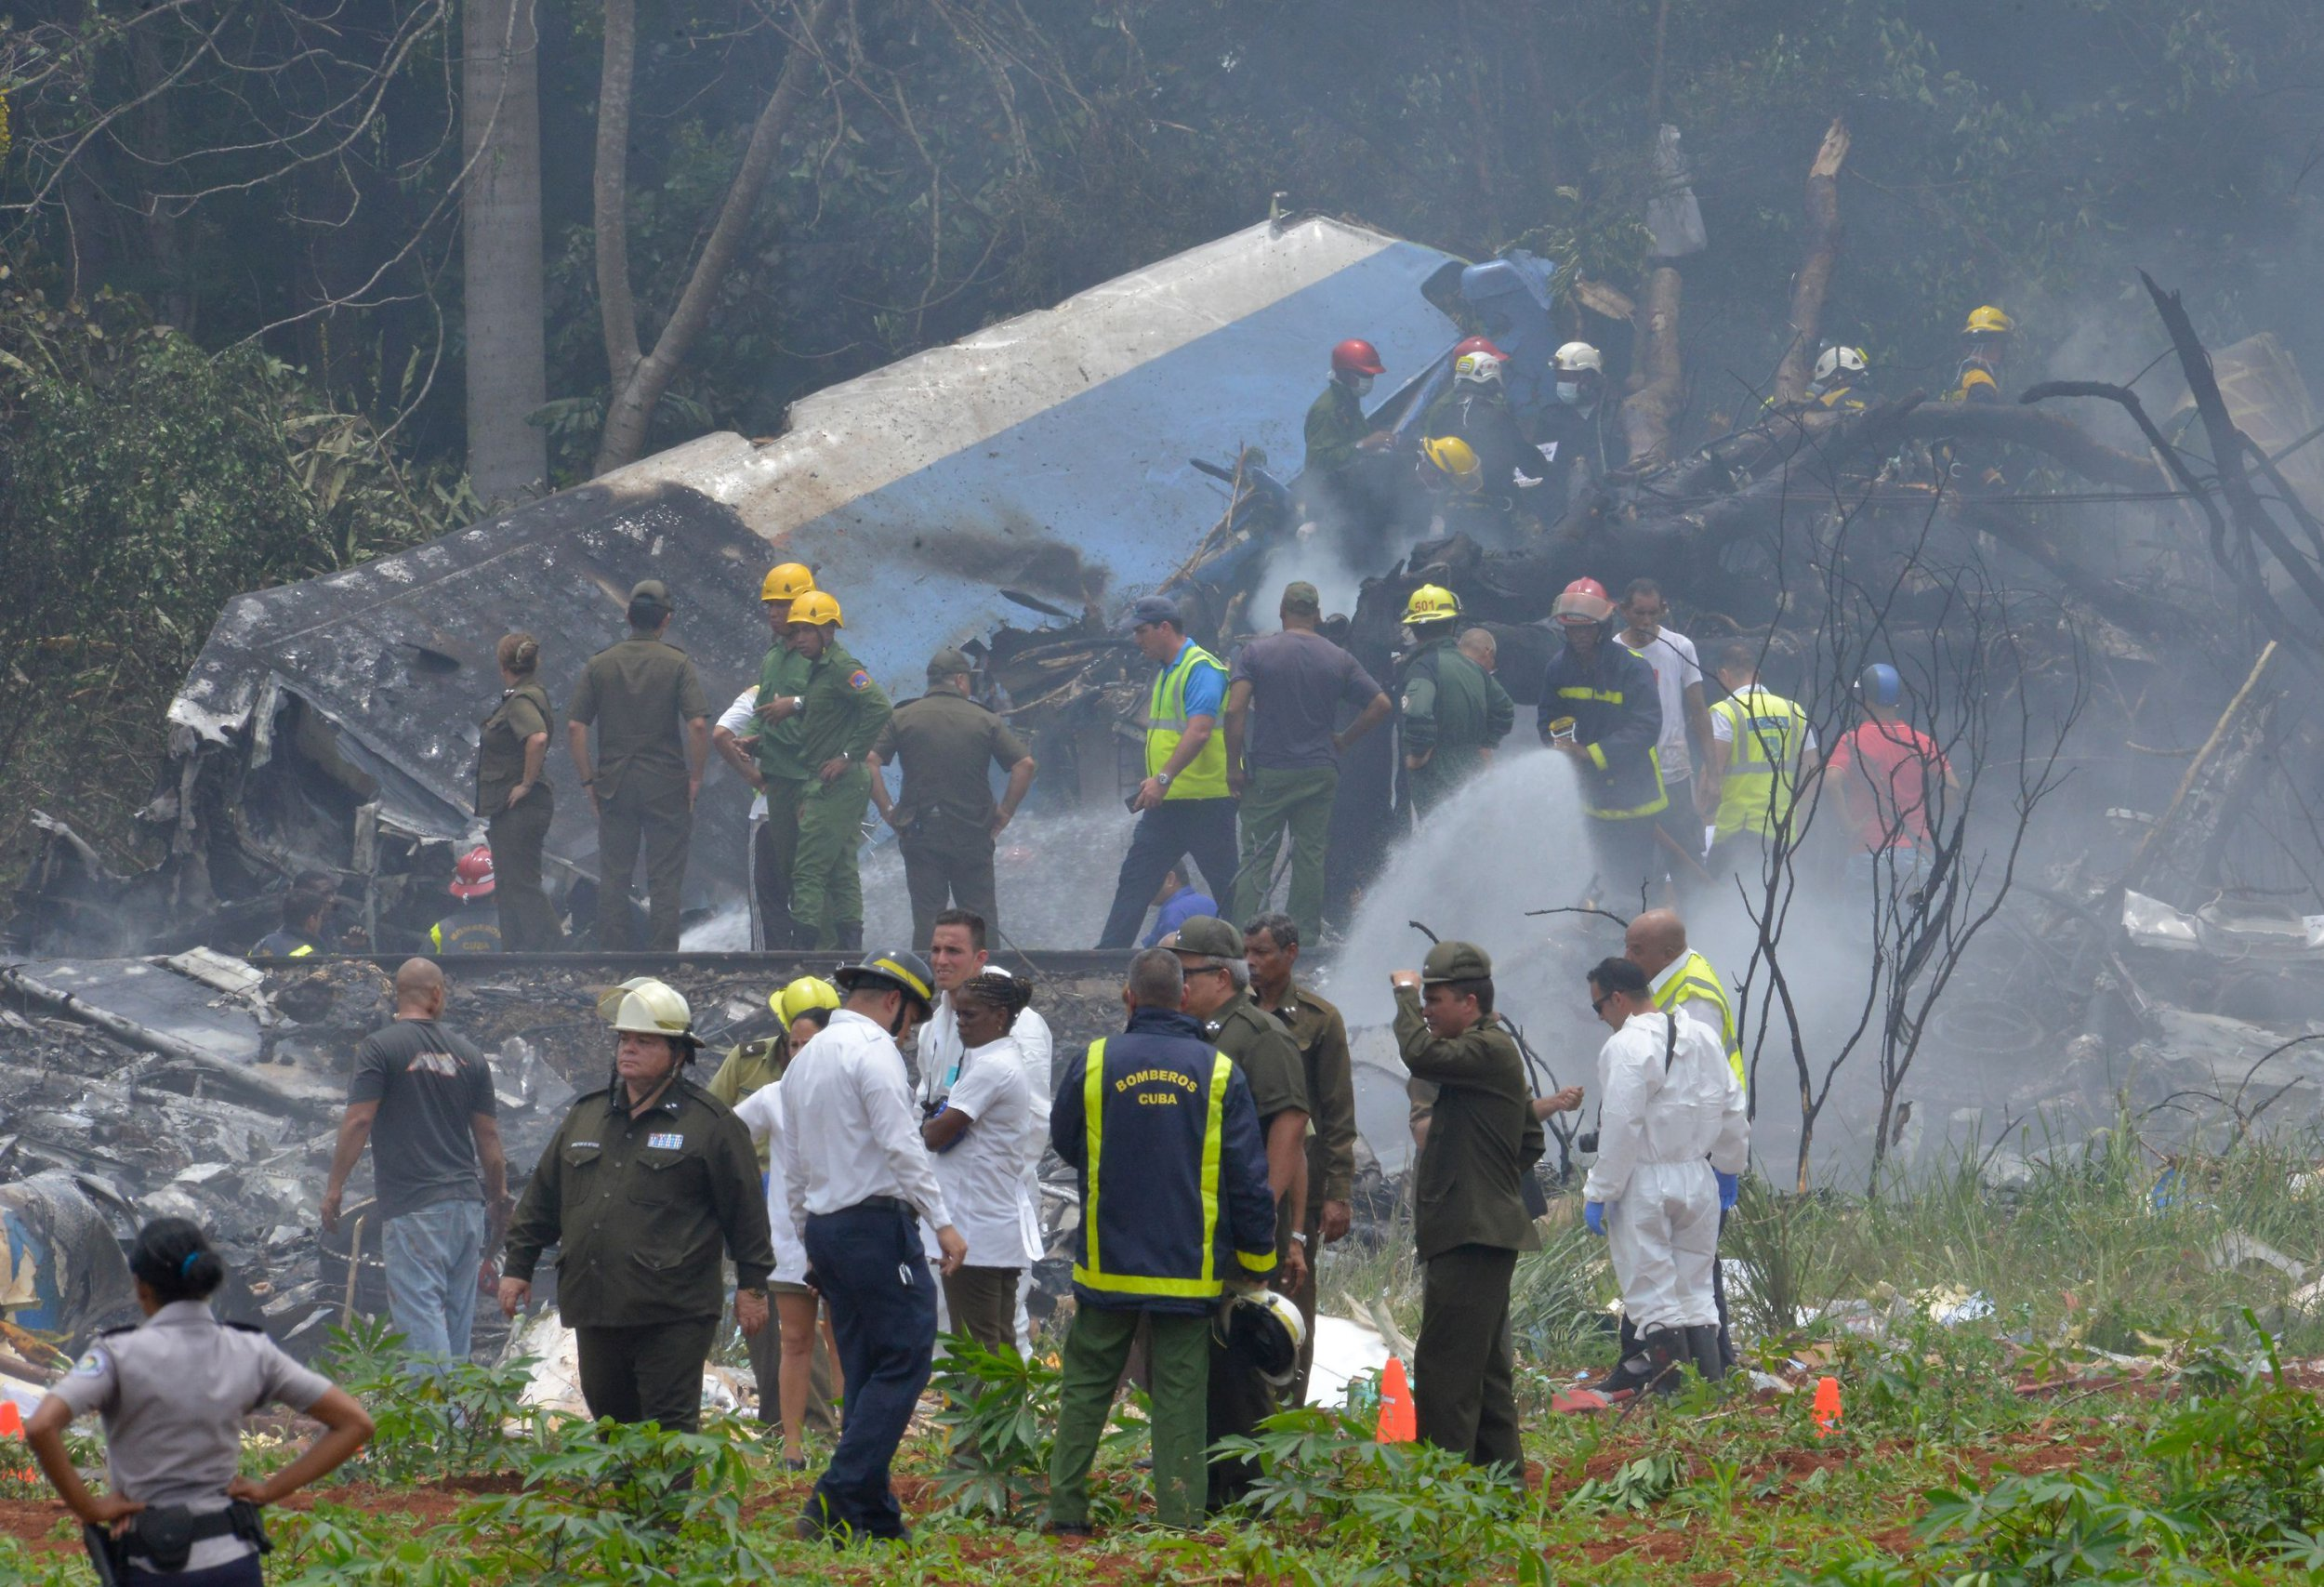 Plane 'containing 104 passengers' crashes in Havana, Cuba